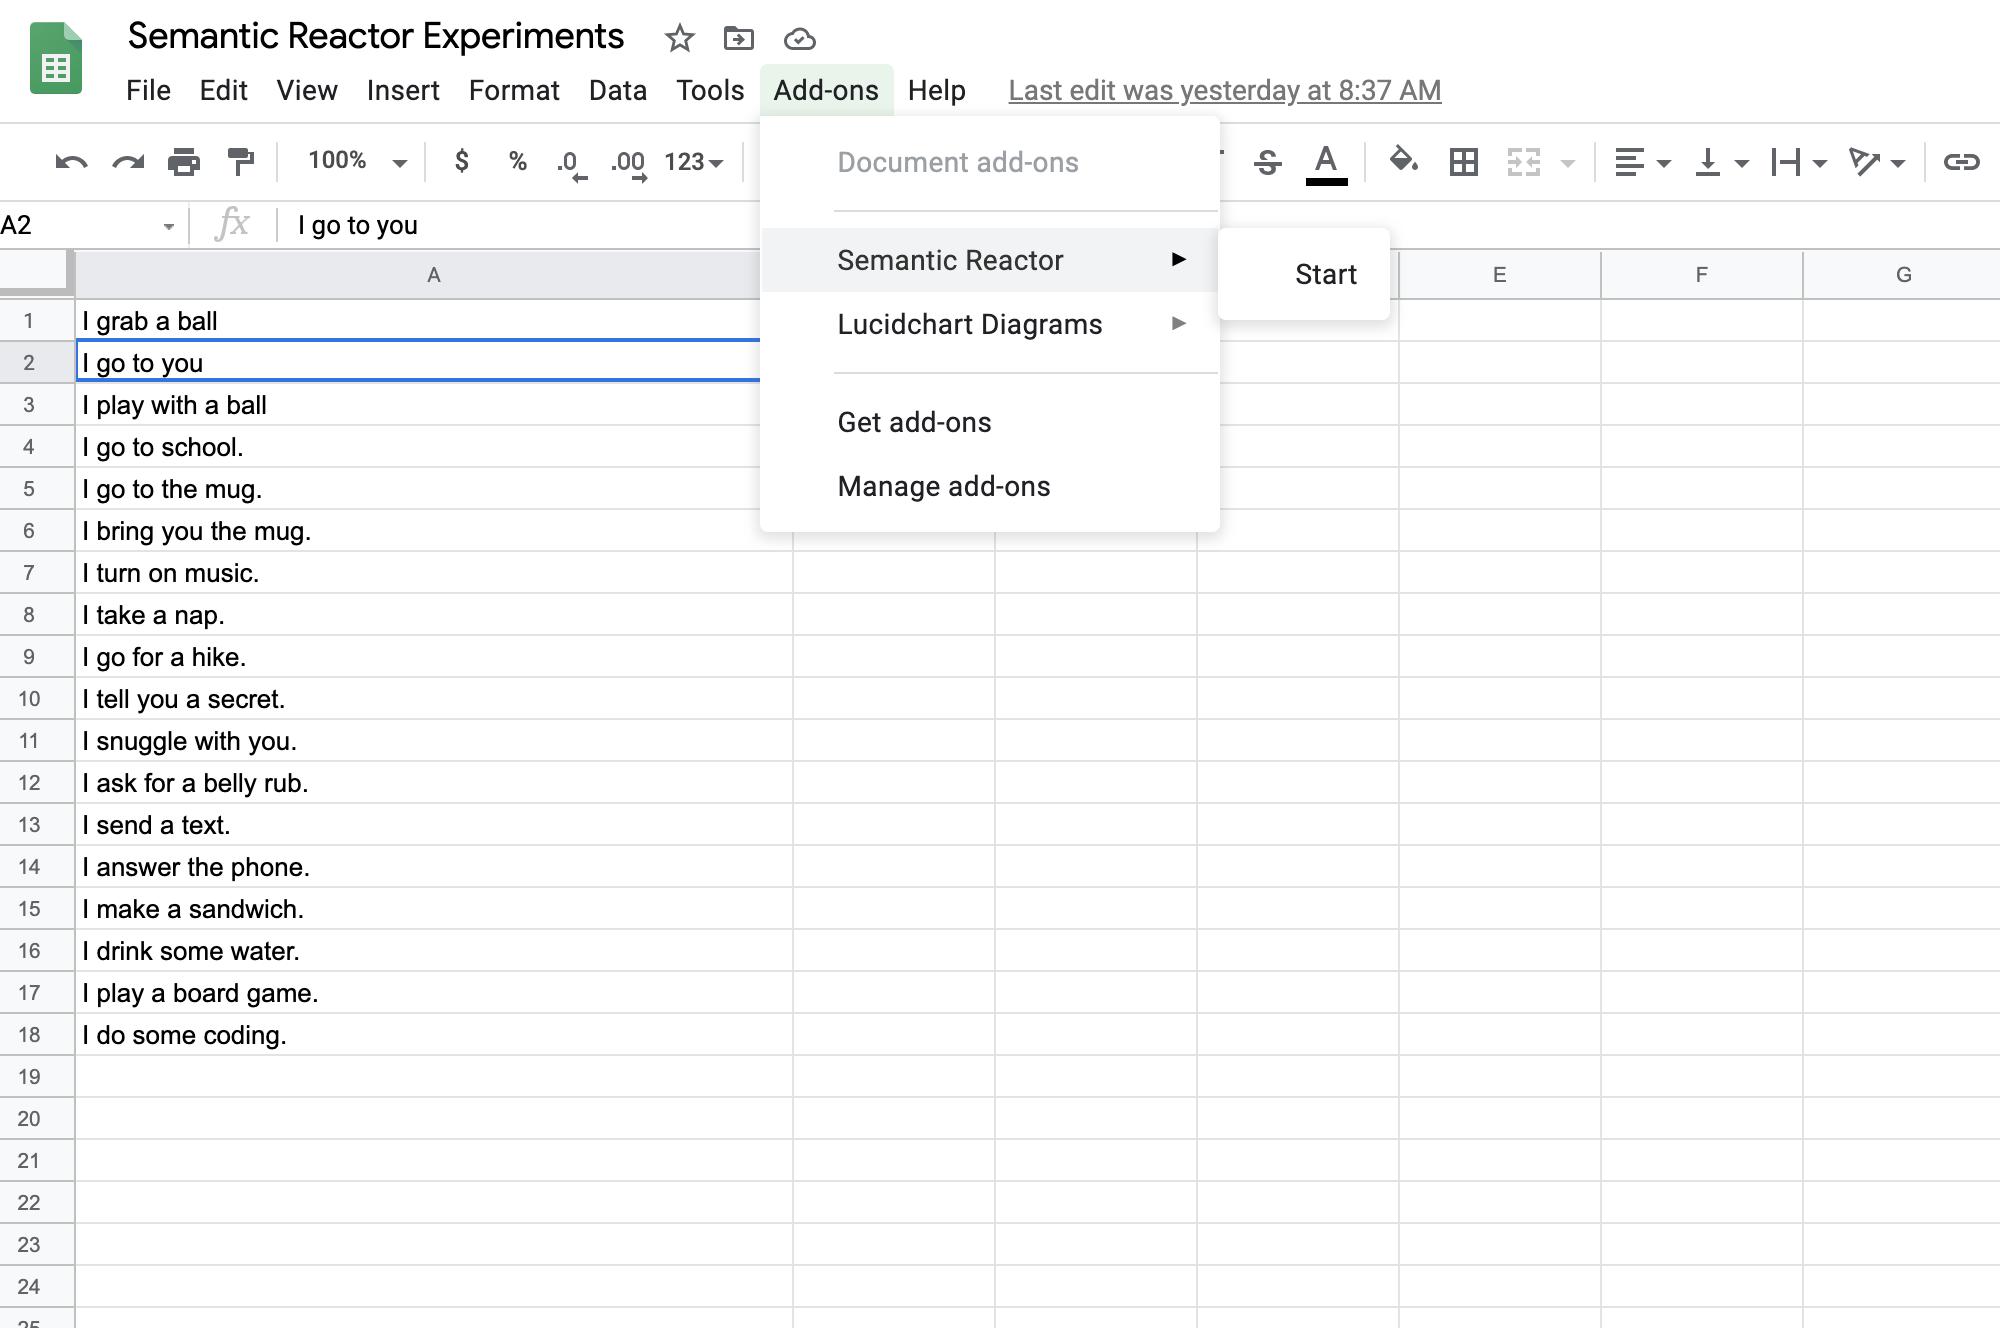 A screenshot of starting Semantic Reactor